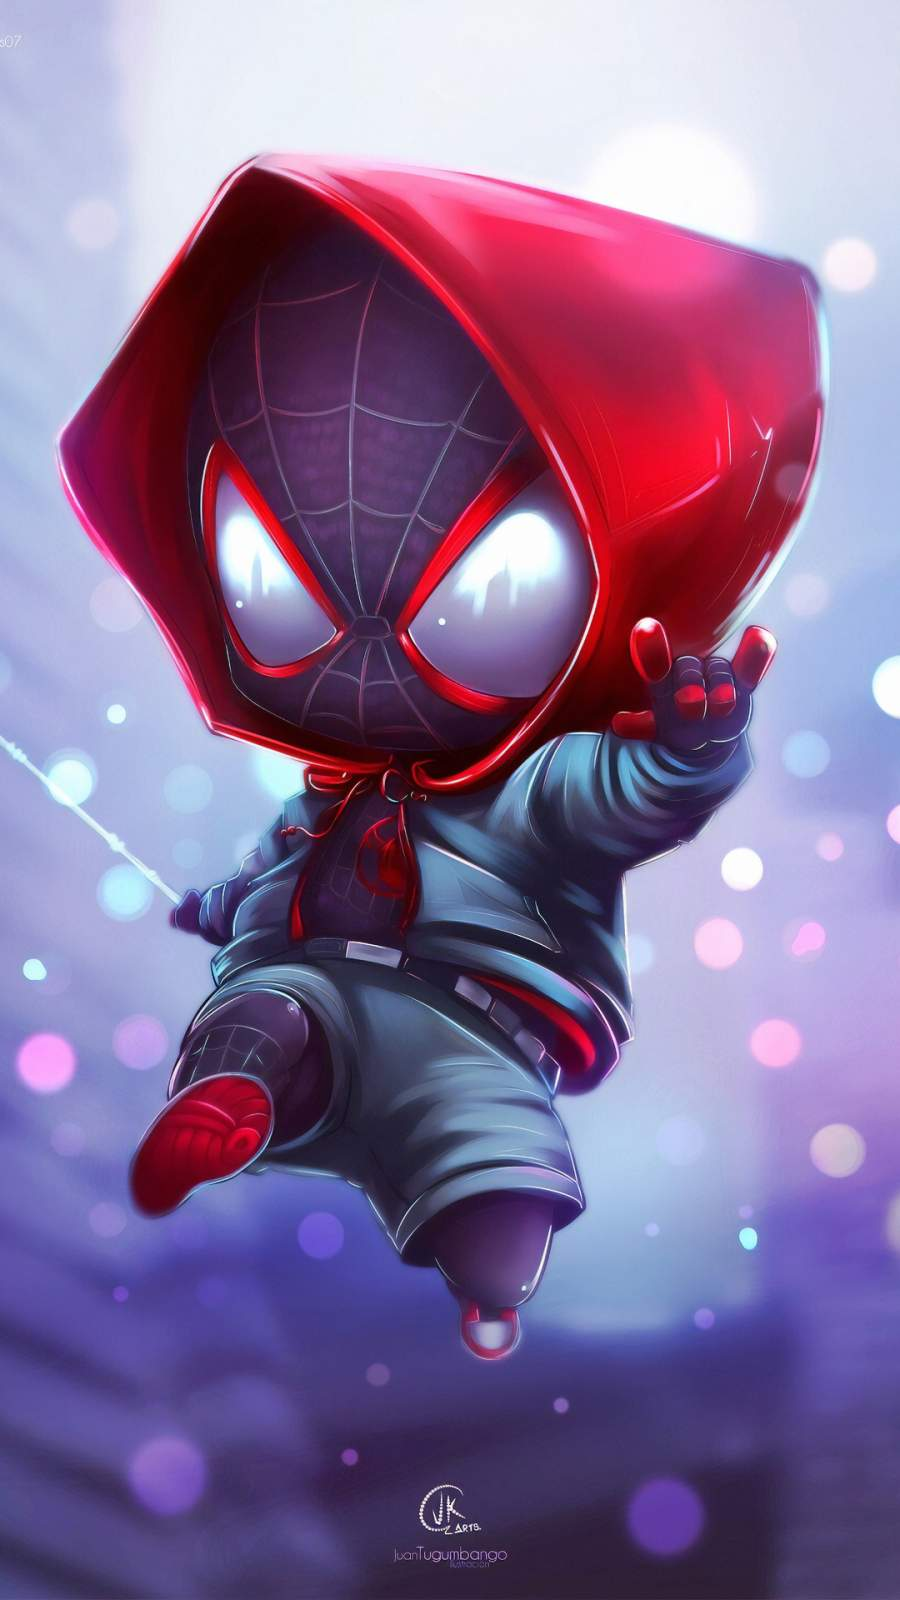 Adorable Spiderman iPhone Wallpaper